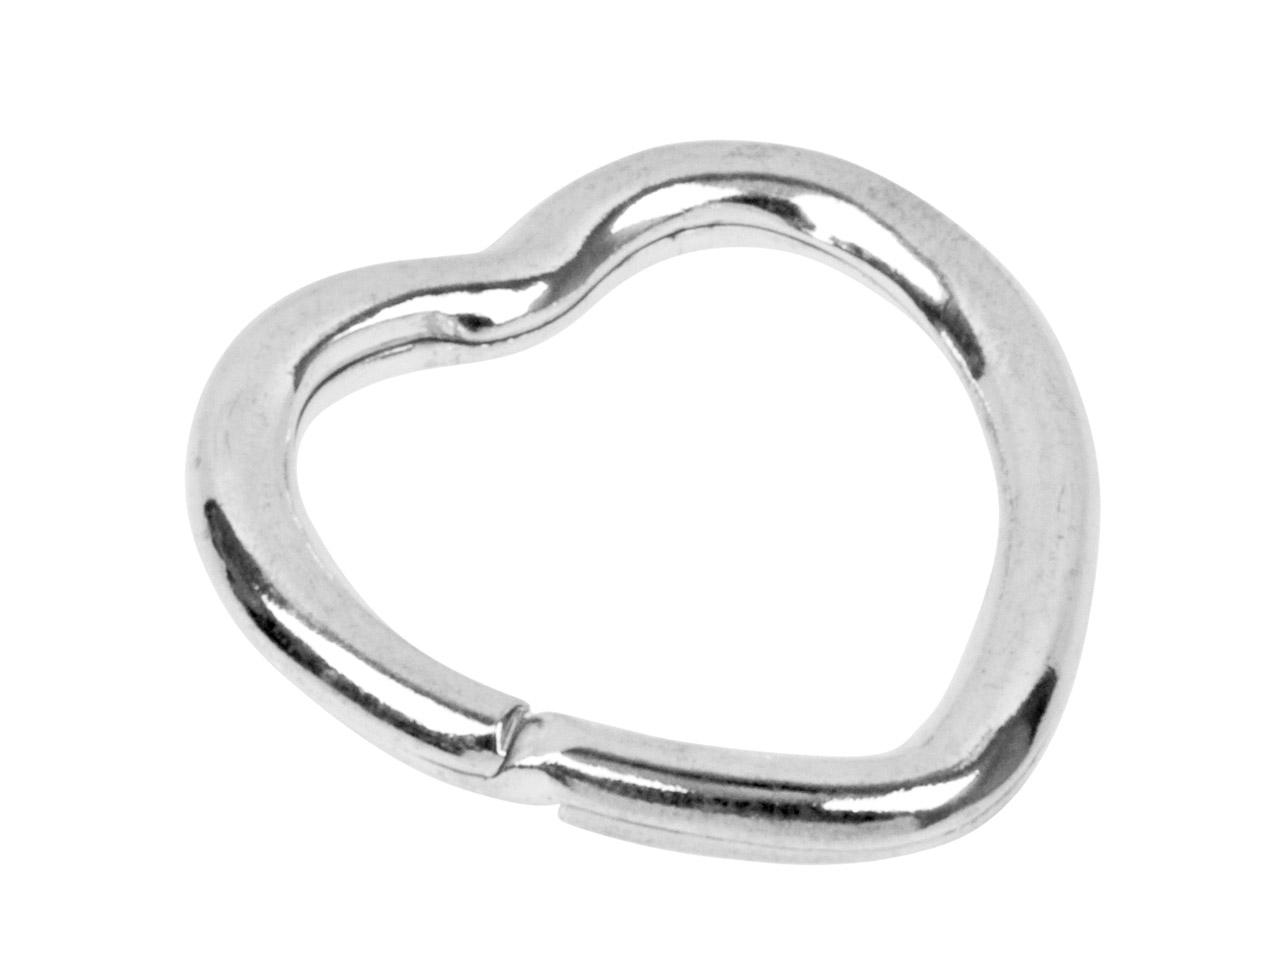 5a4d66937d11 Sterling Silver Key Ring 30mm Split Ring